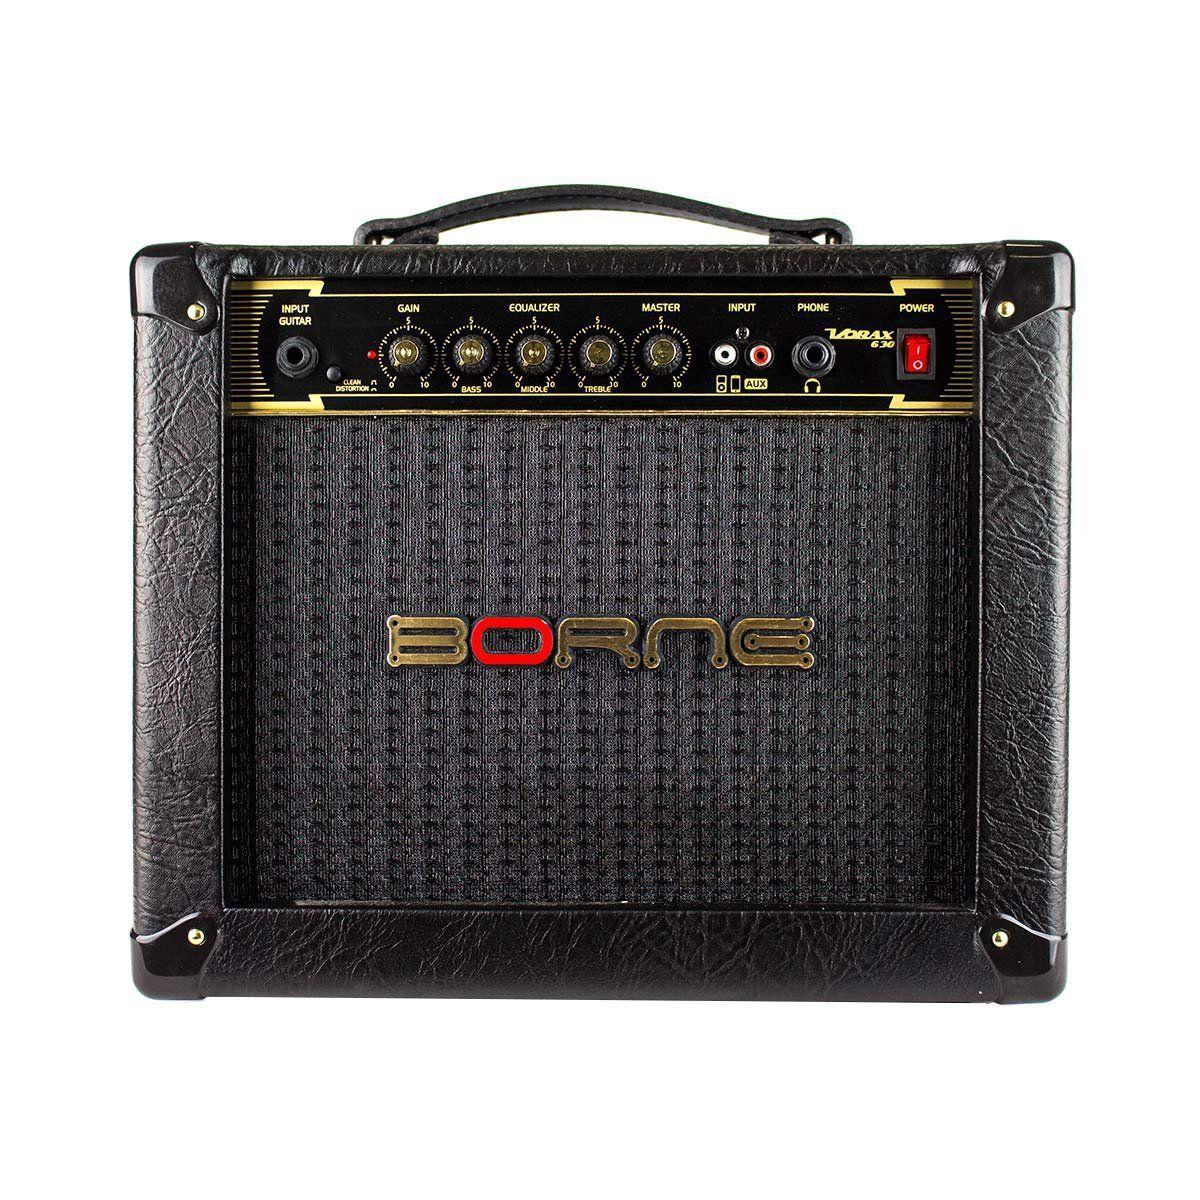 Caixa Amplificada Borne Vorax 630 1x6 25W RMS